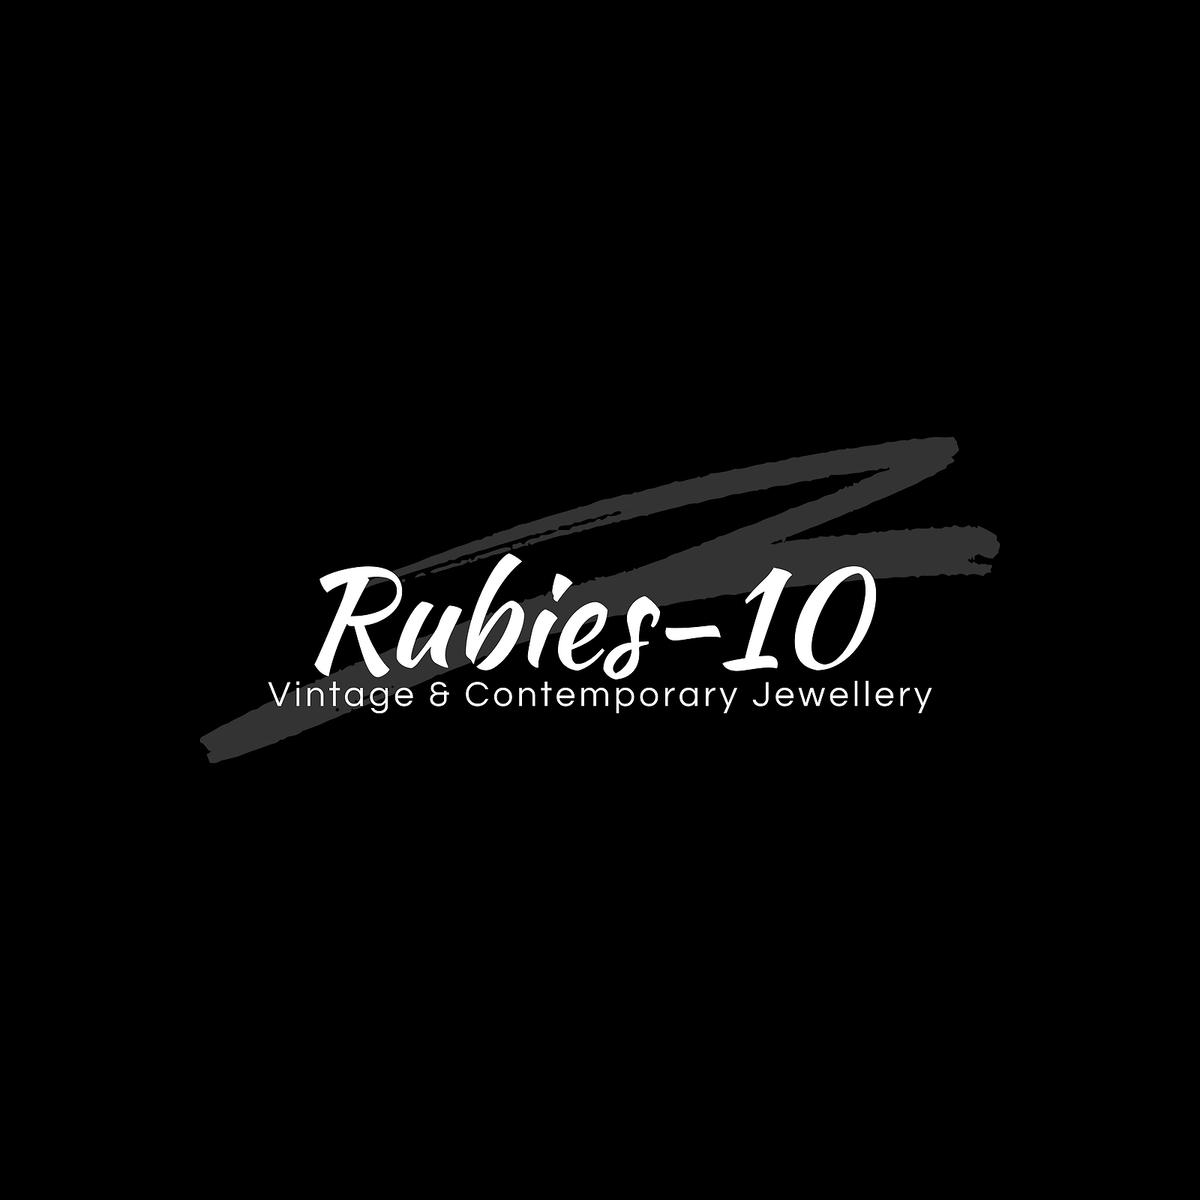 rubies10jewellery